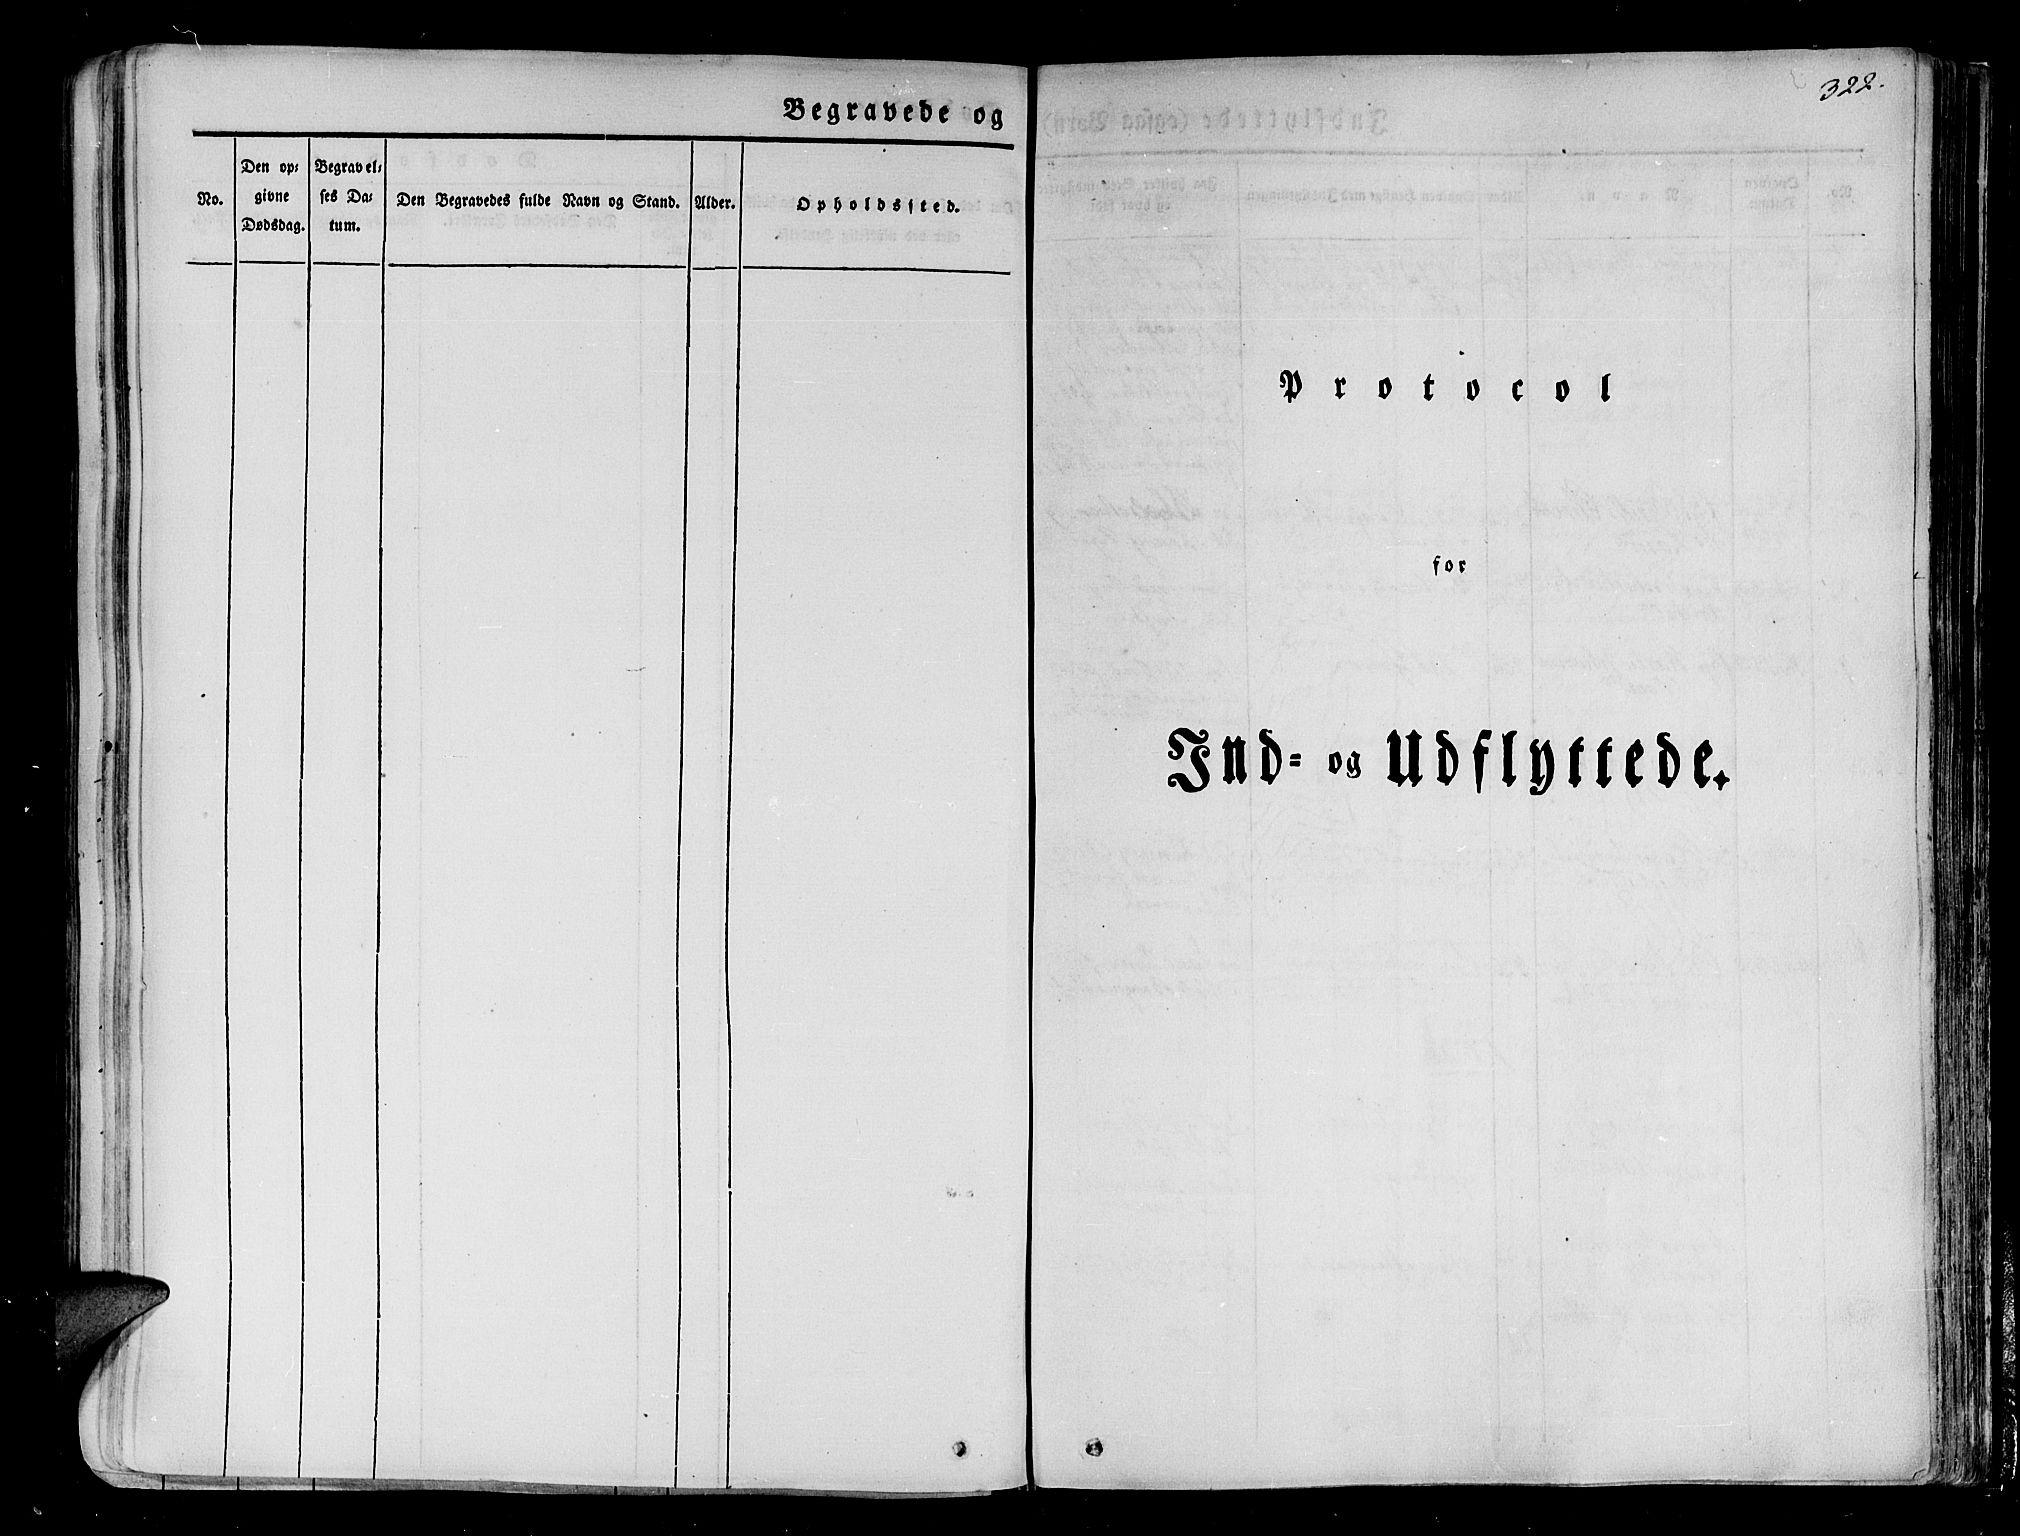 SATØ, Tranøy sokneprestkontor, I/Ia/Iaa/L0005kirke: Ministerialbok nr. 5, 1829-1844, s. 322